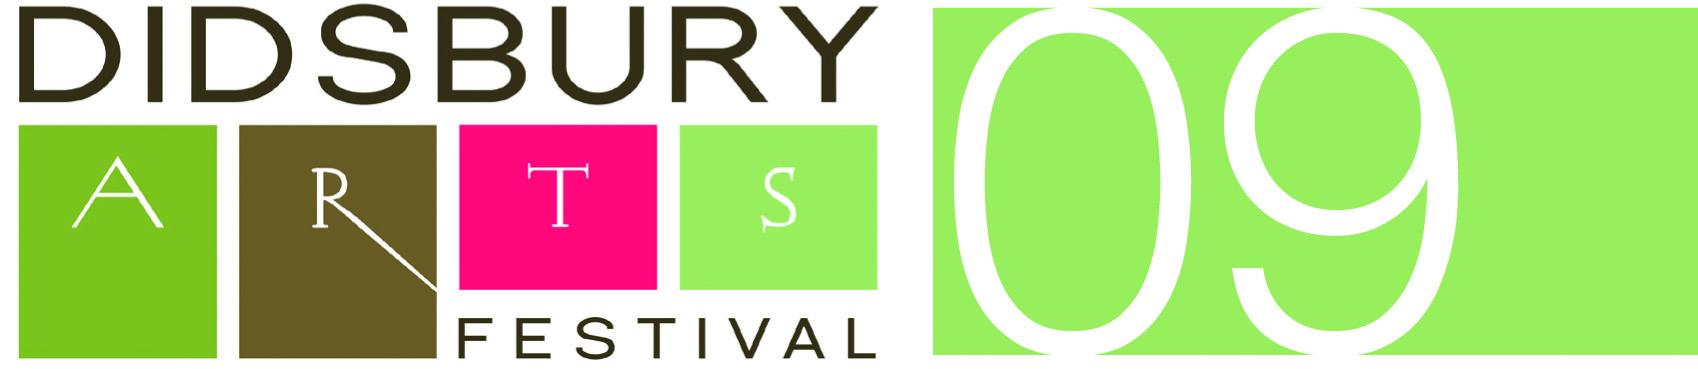 Didsbury Arts festival logo (ben)